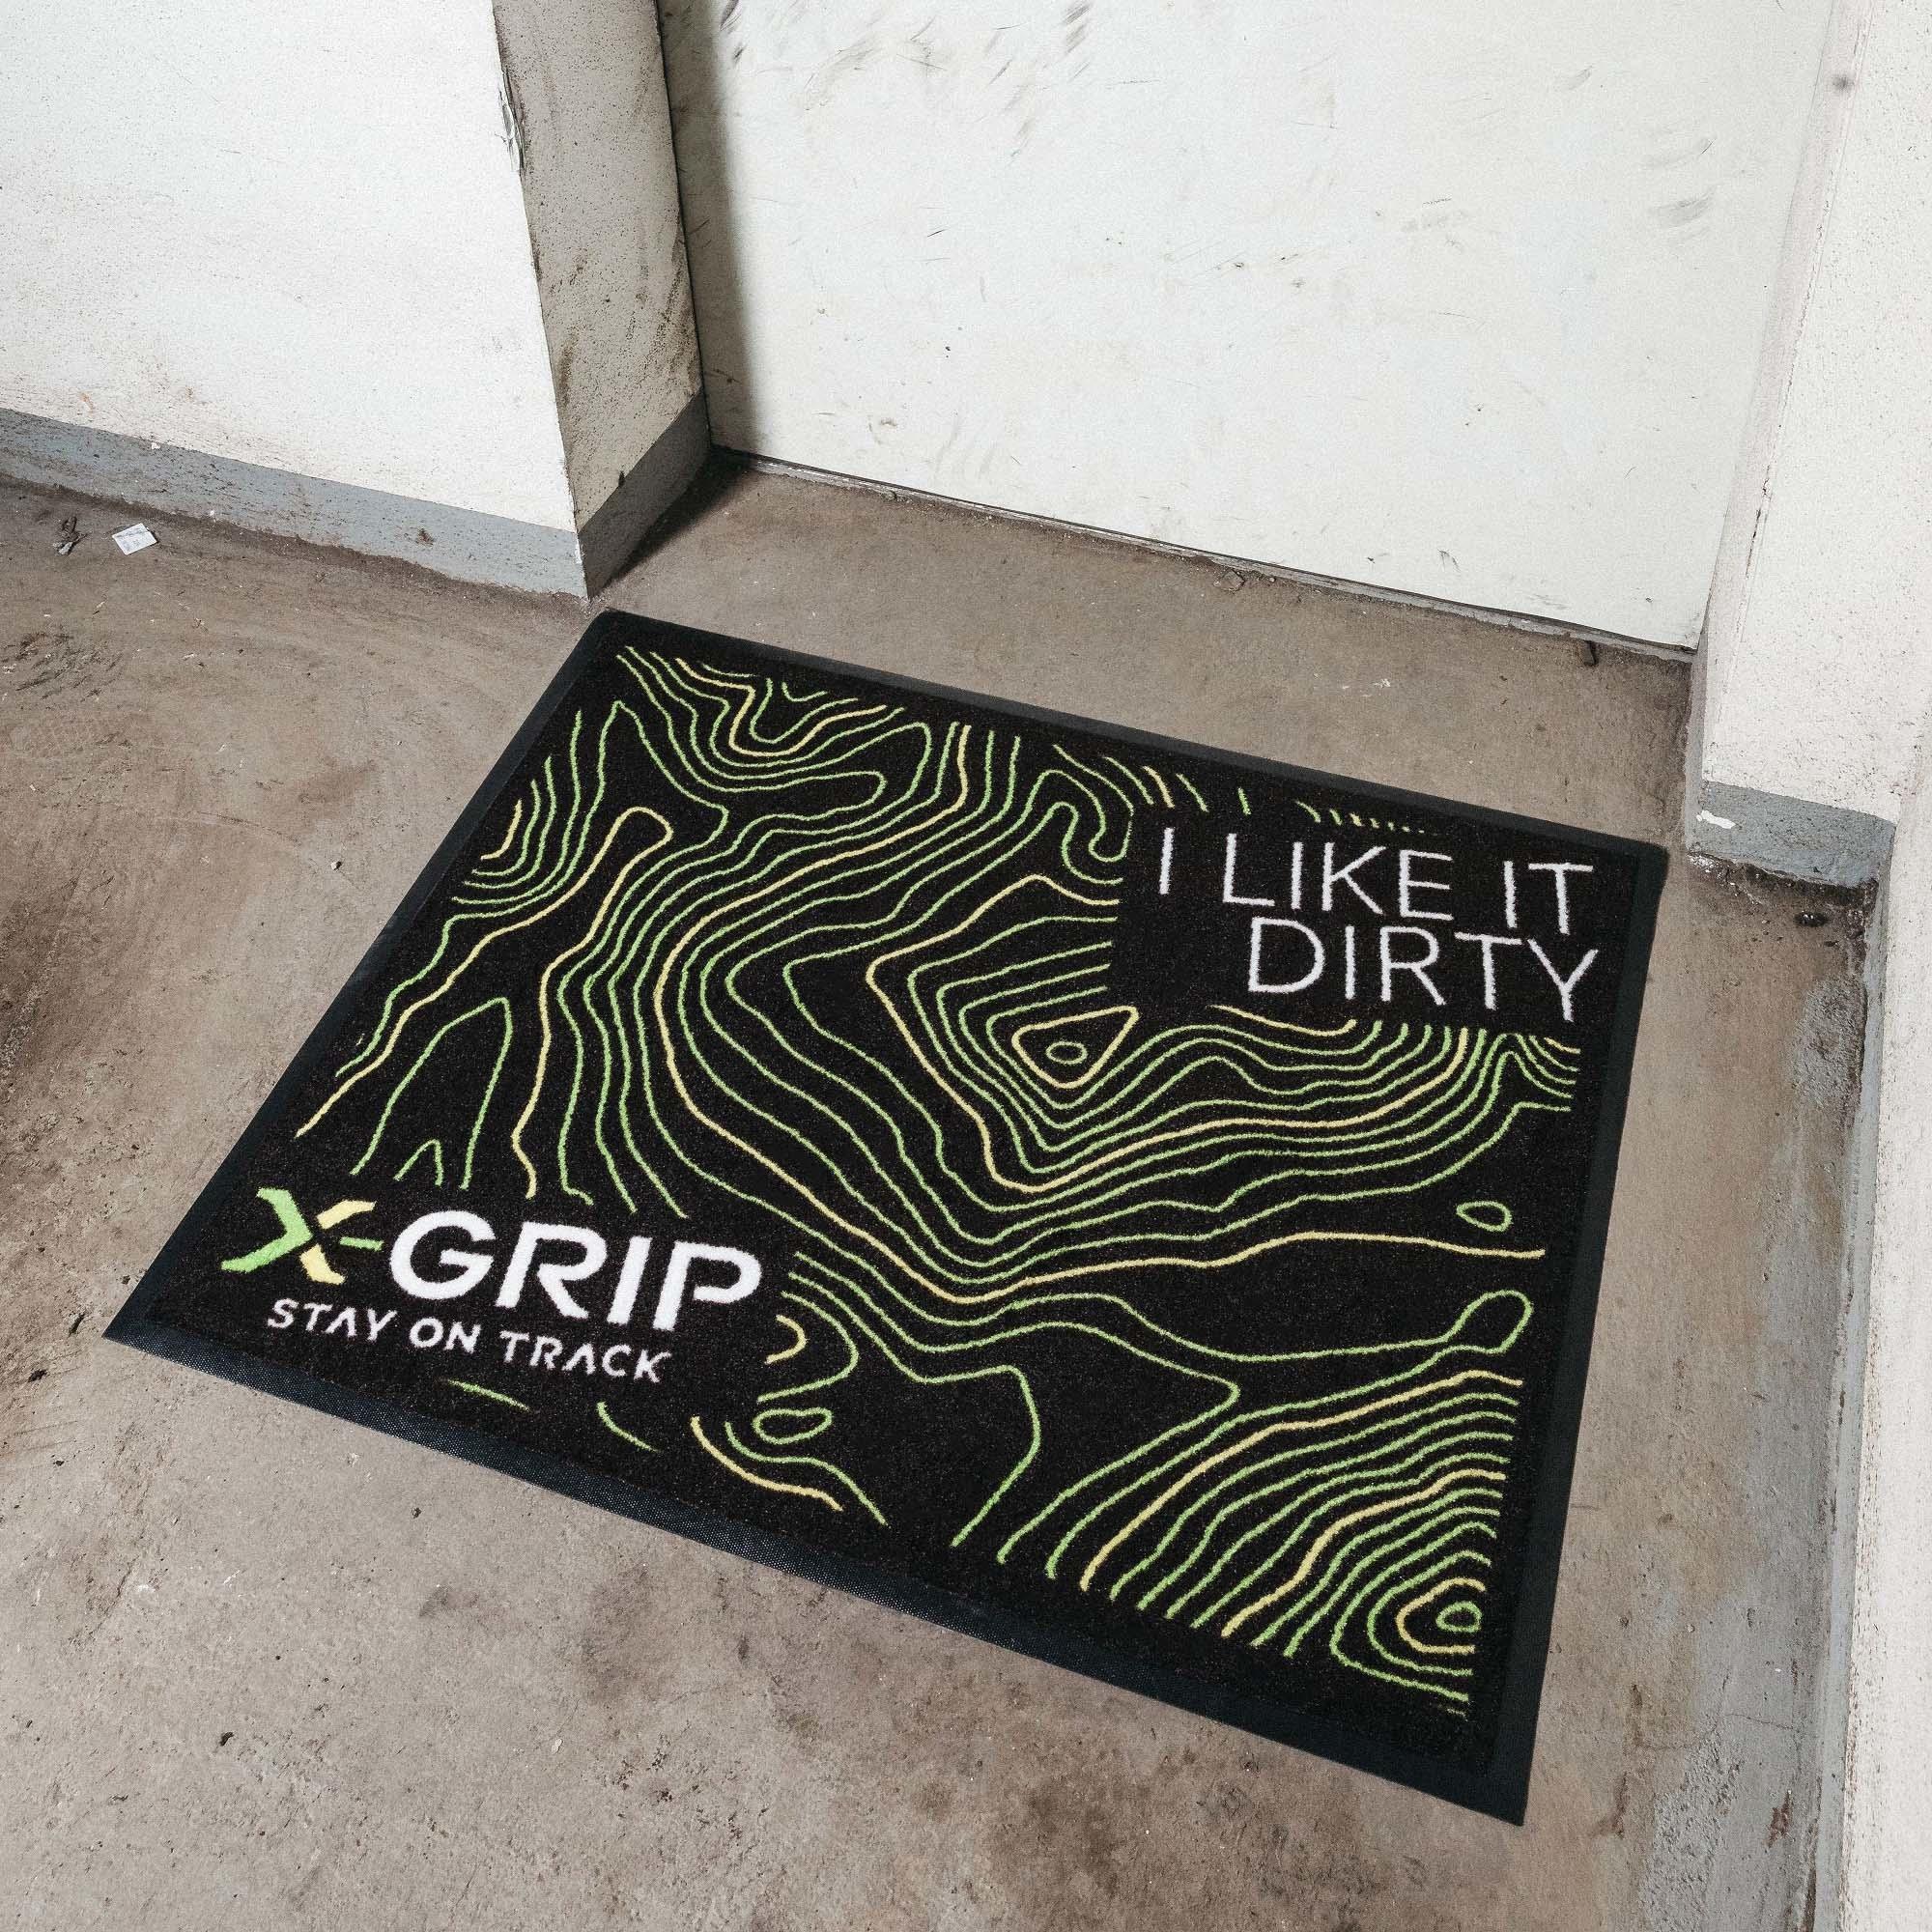 X-GRIP Türmatte / Teppich